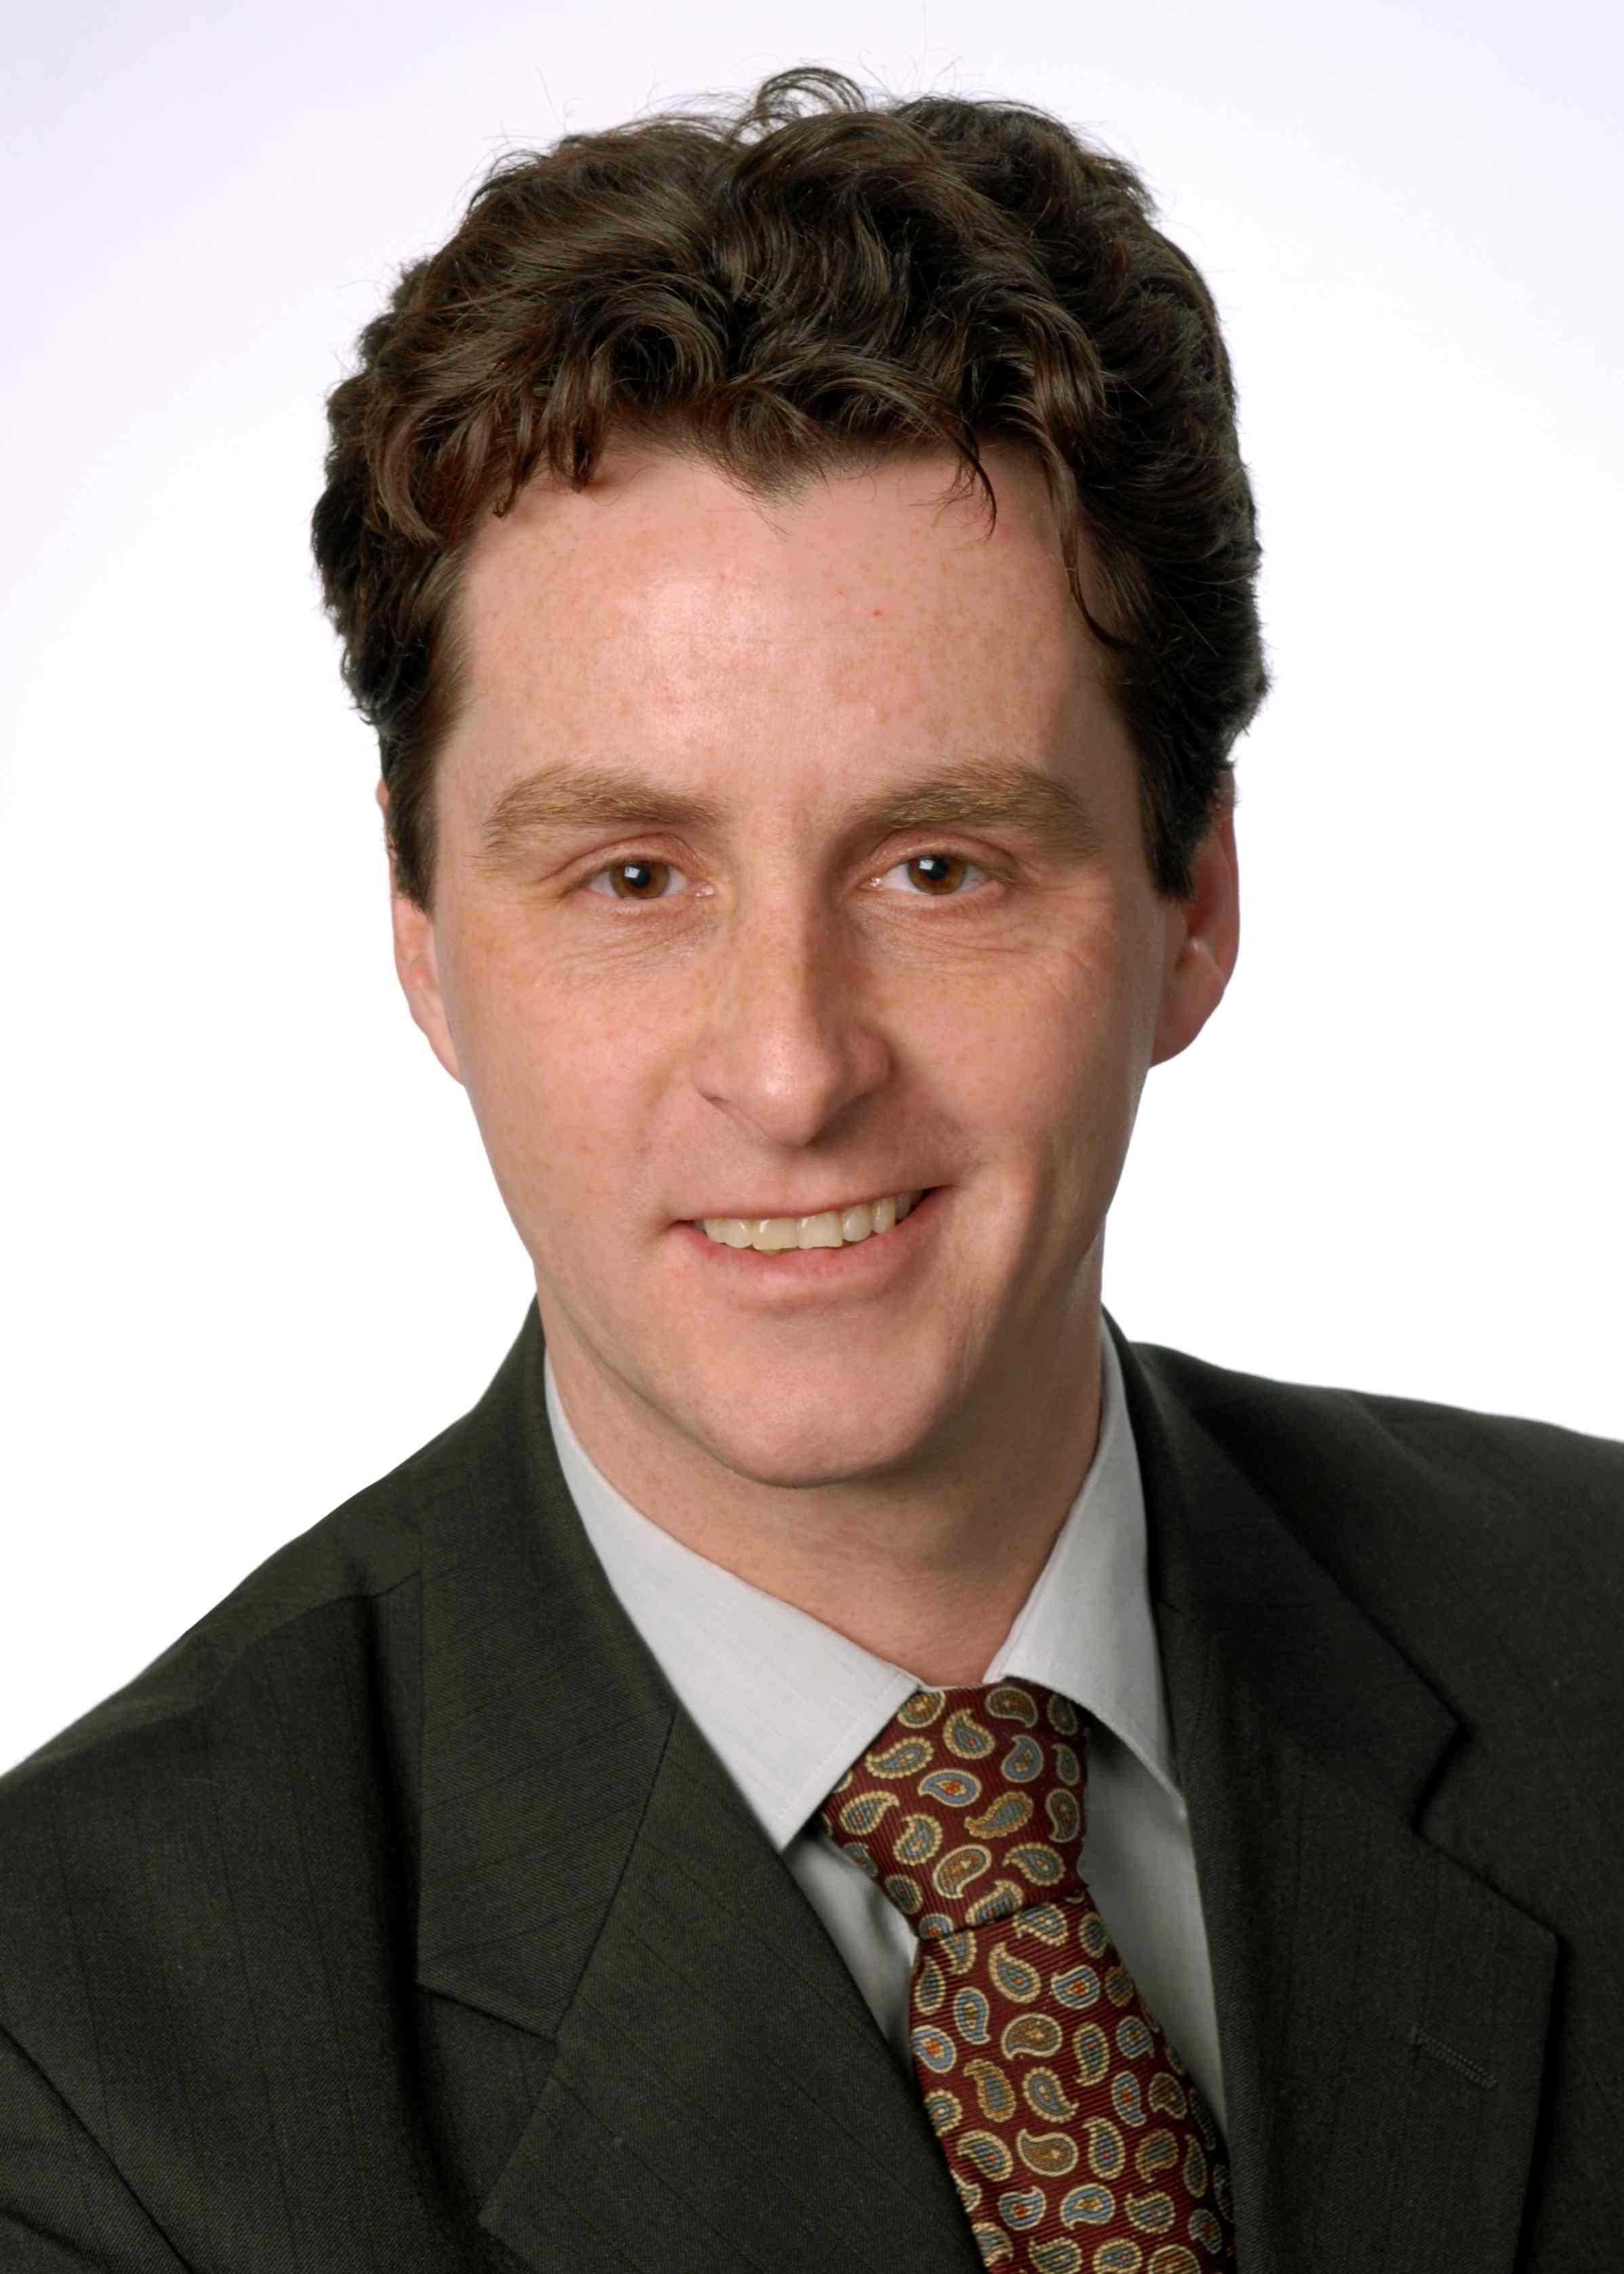 Dr. Boris Keweloh Gründer Cardiolectra GmbH